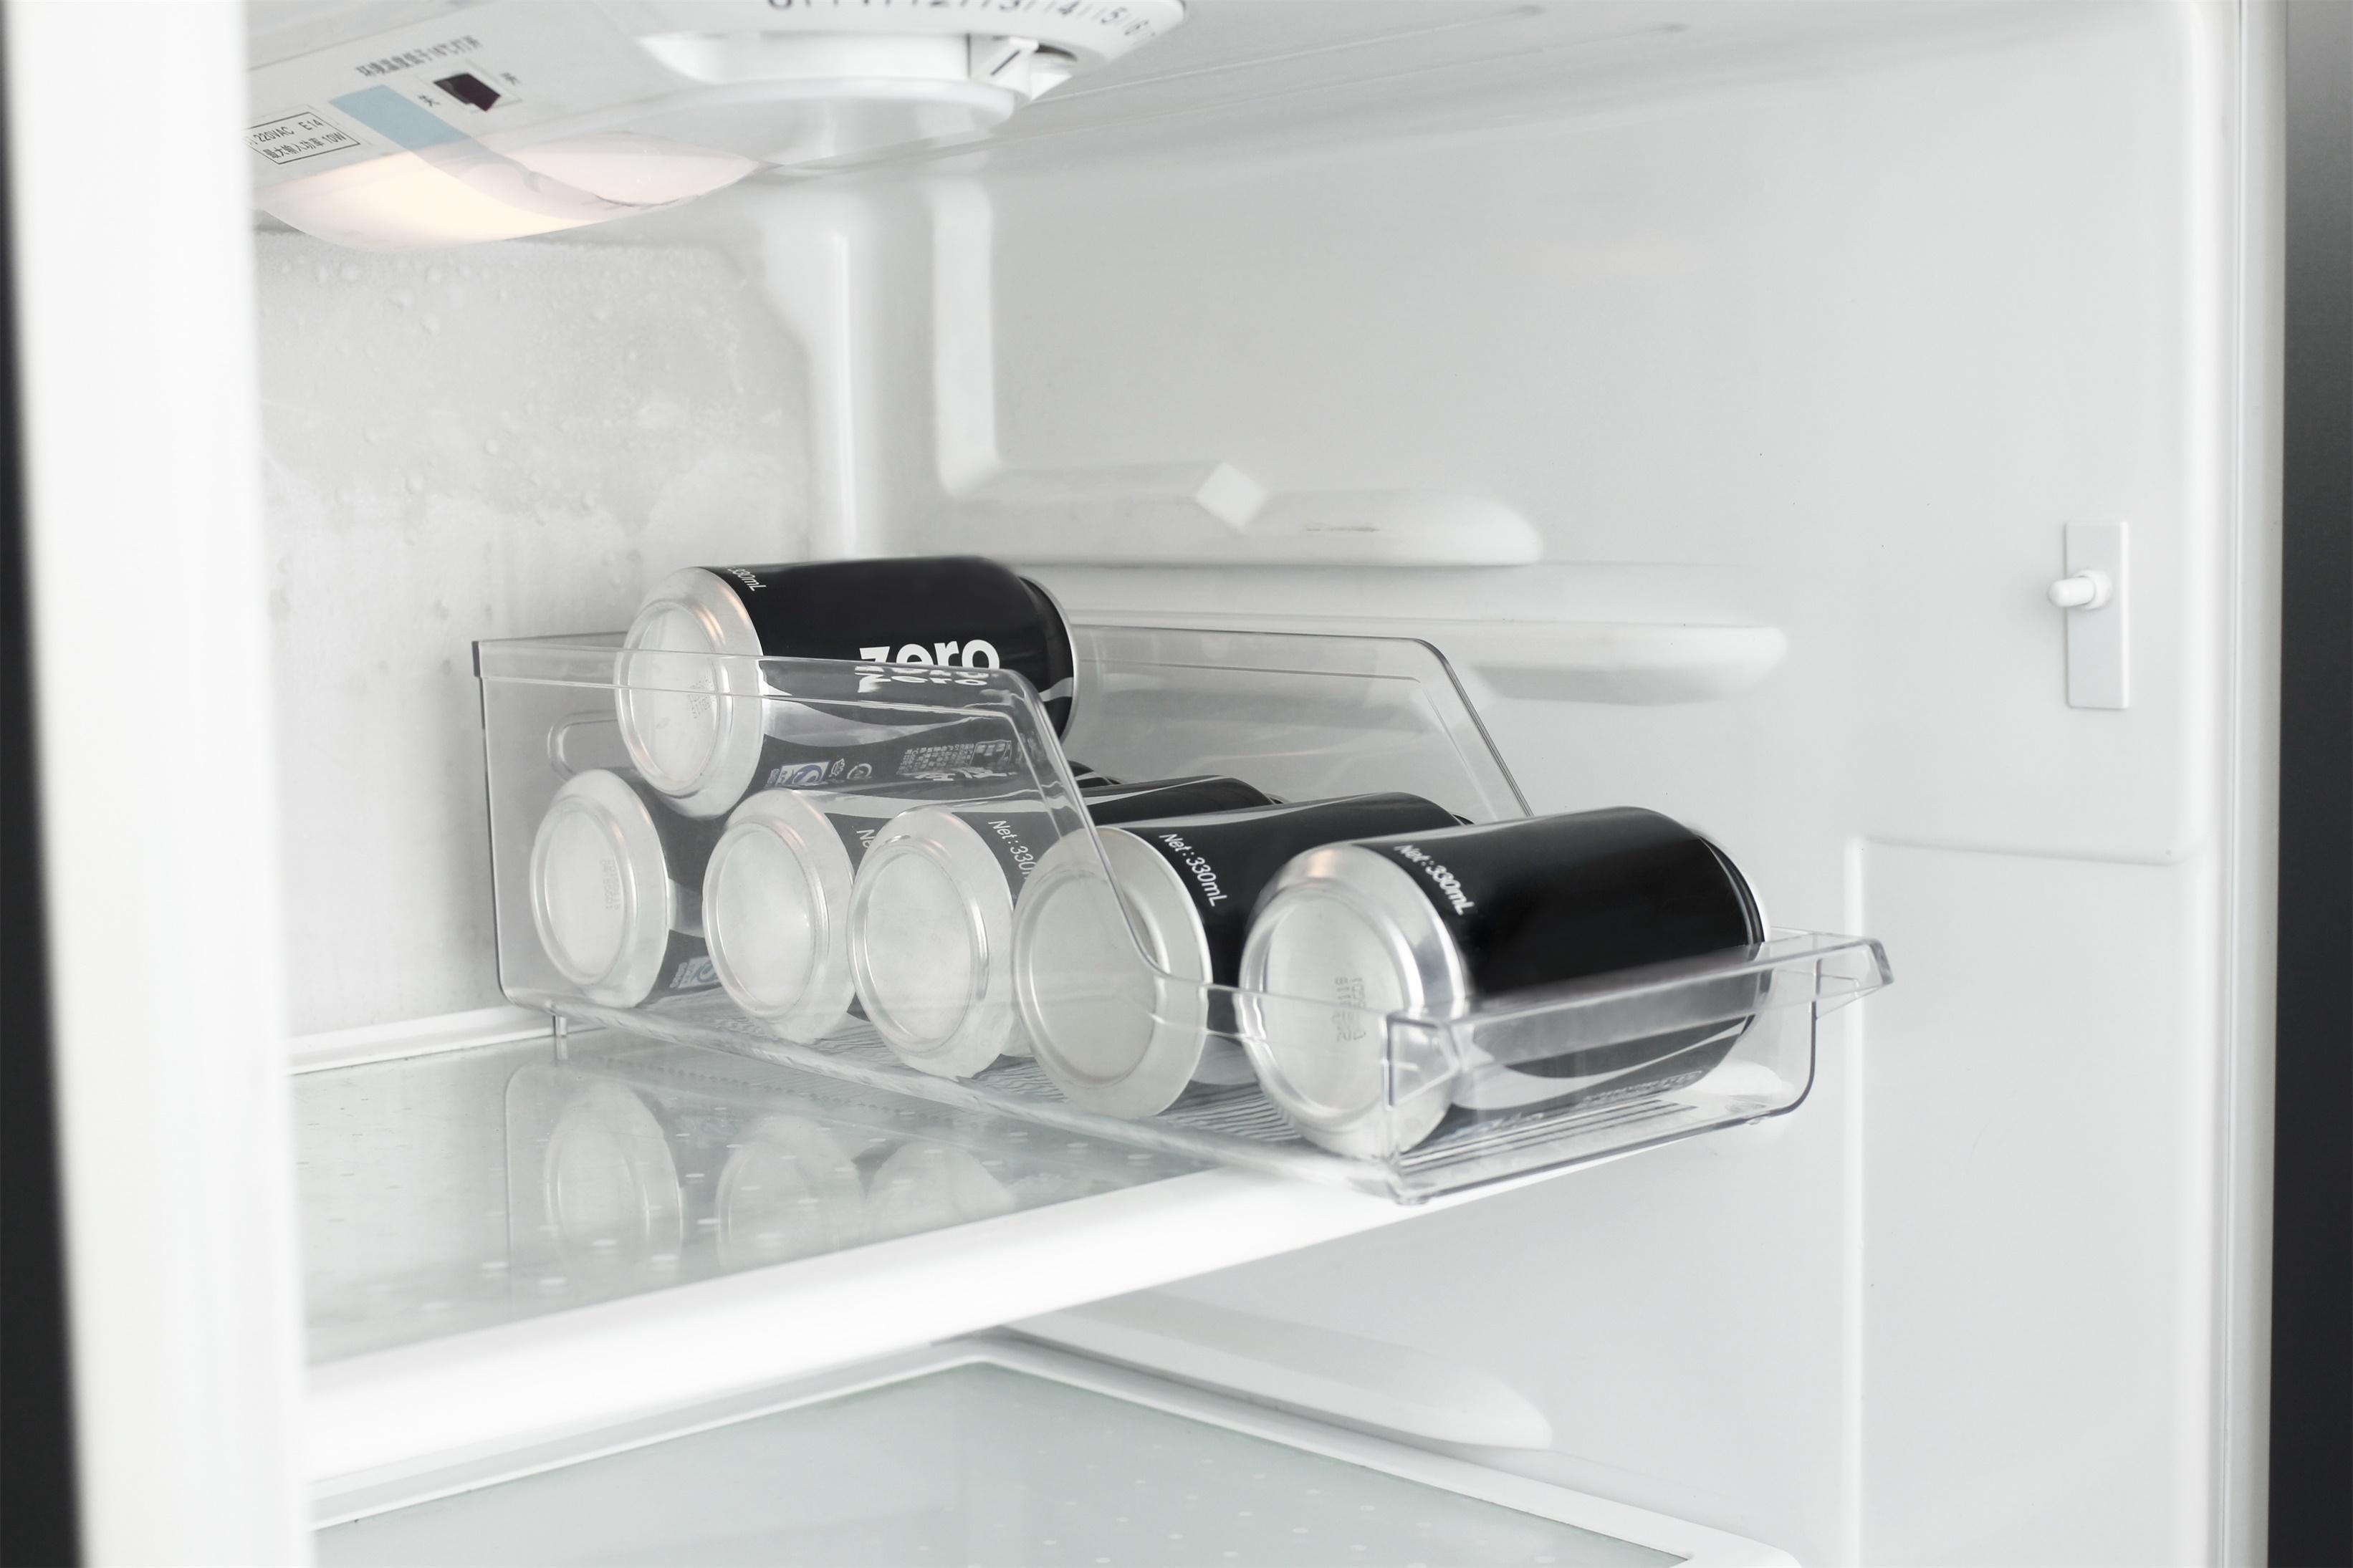 Kühlschrank Organizer Stapelbar : Kühlschrank aufbewahrung organizer getränkedosen box material